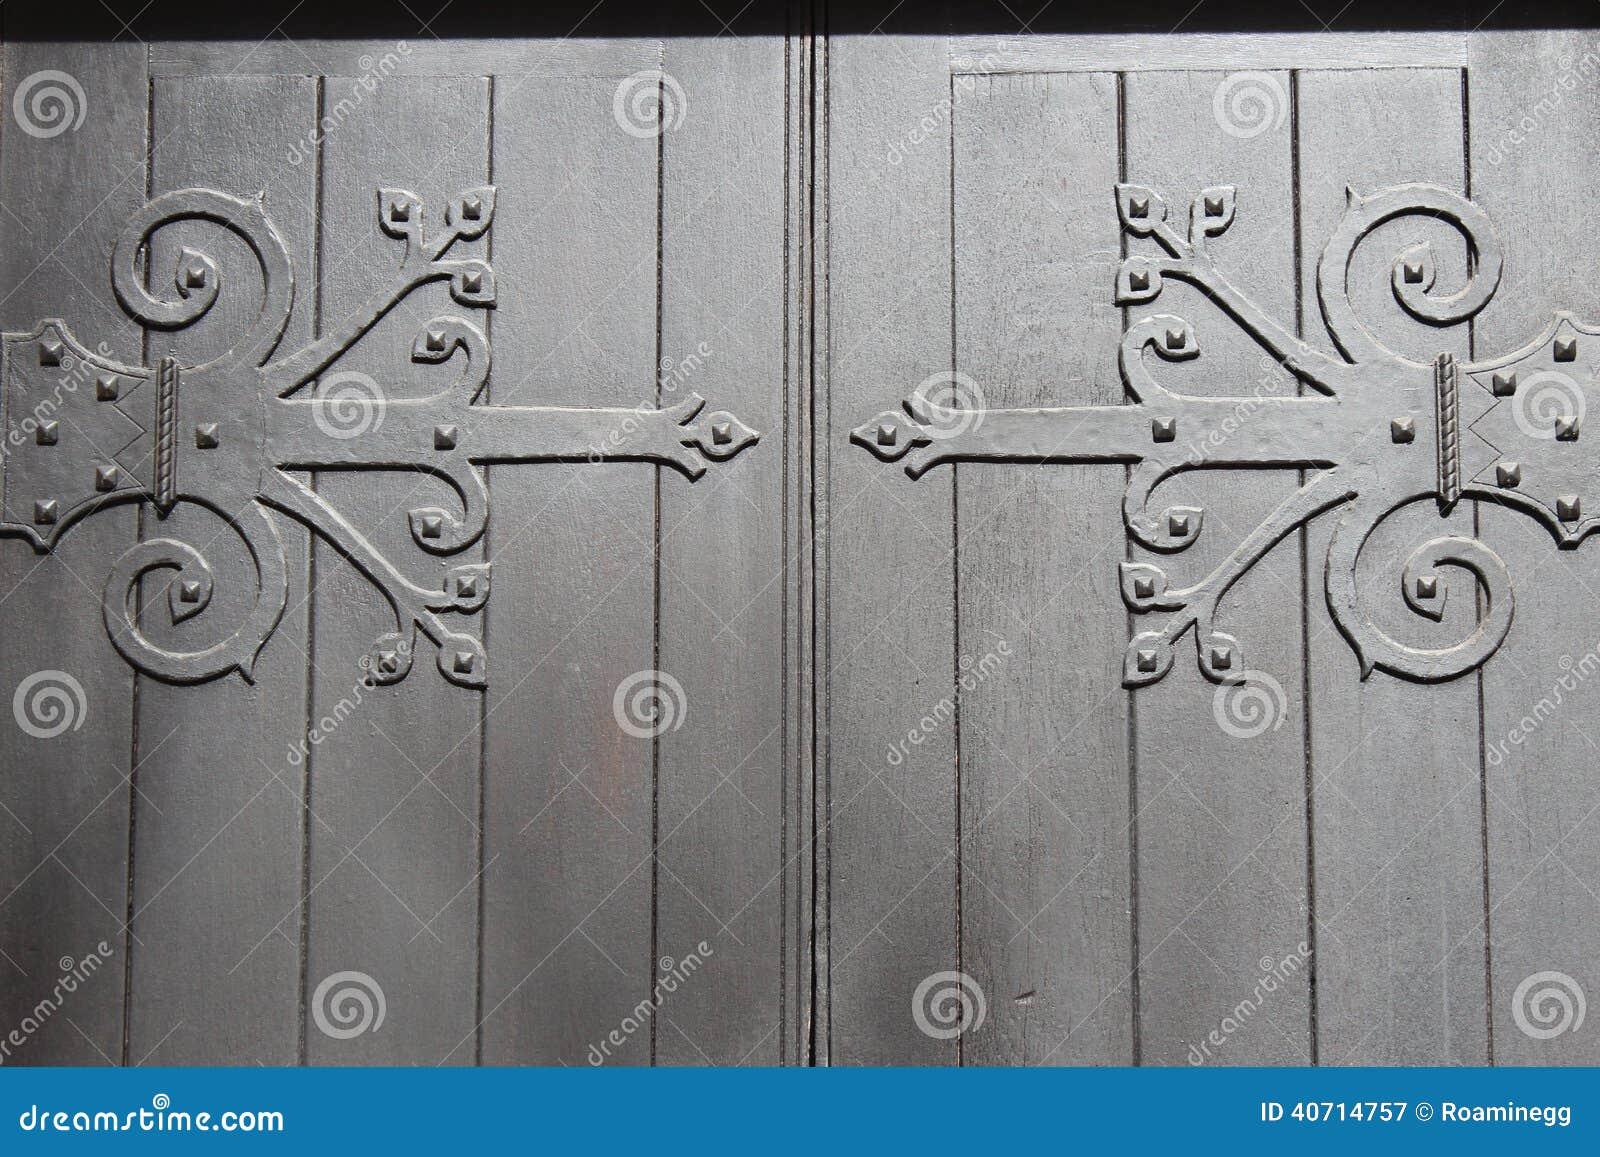 decorative door hinges - Decorative Hinges